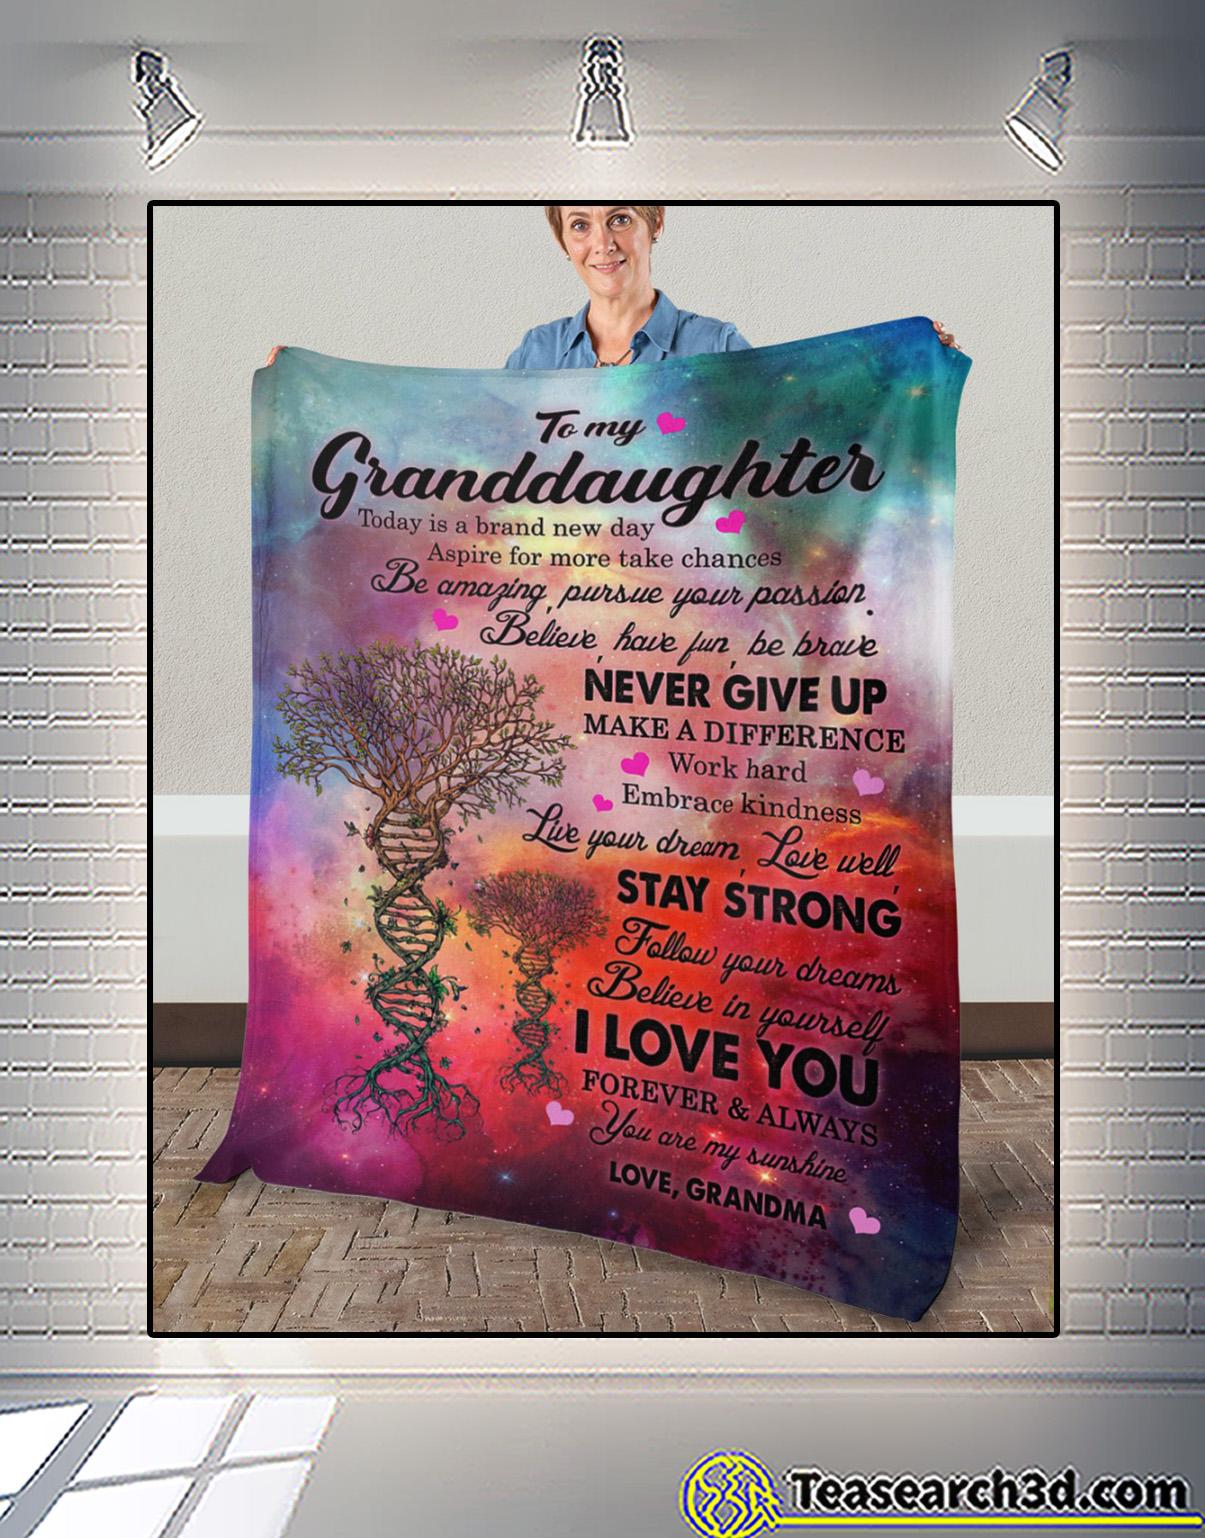 To my granddaughter love grandma fleece blanket 2